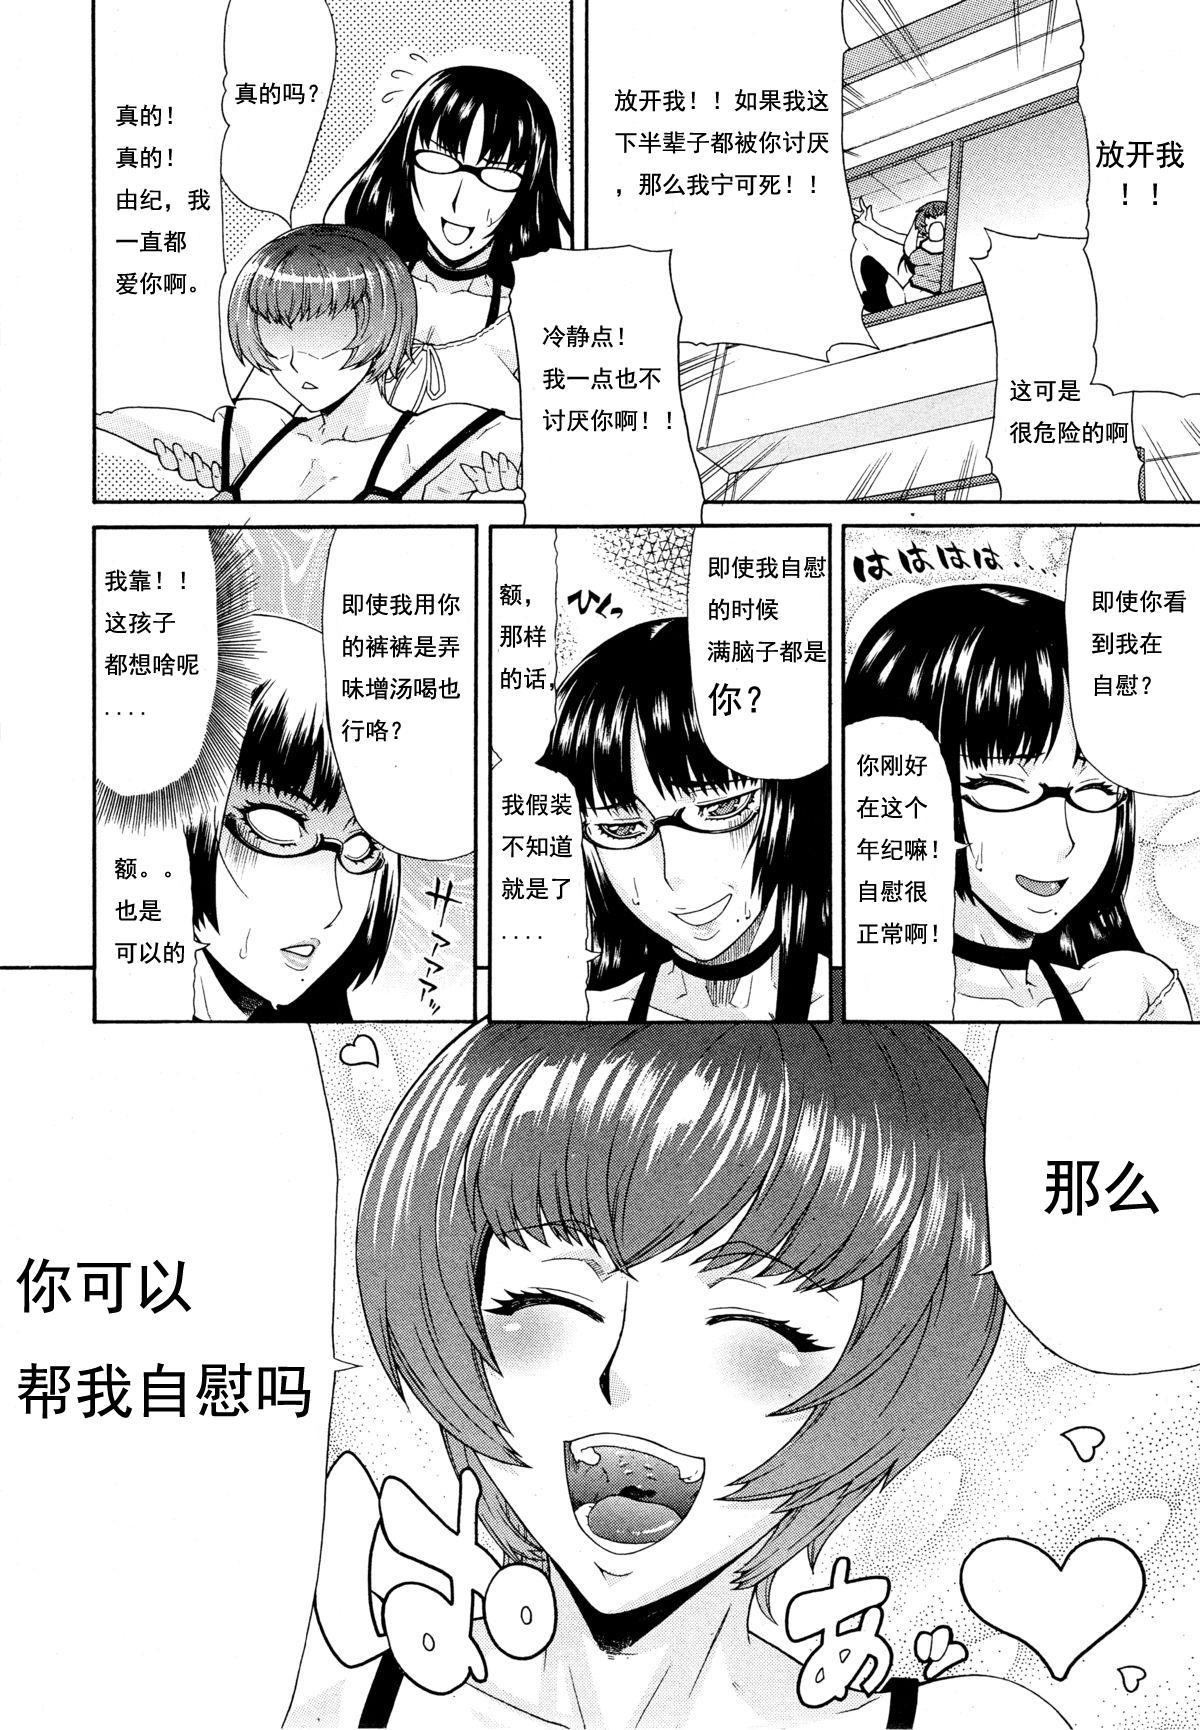 Shimai - Sister Sister 3